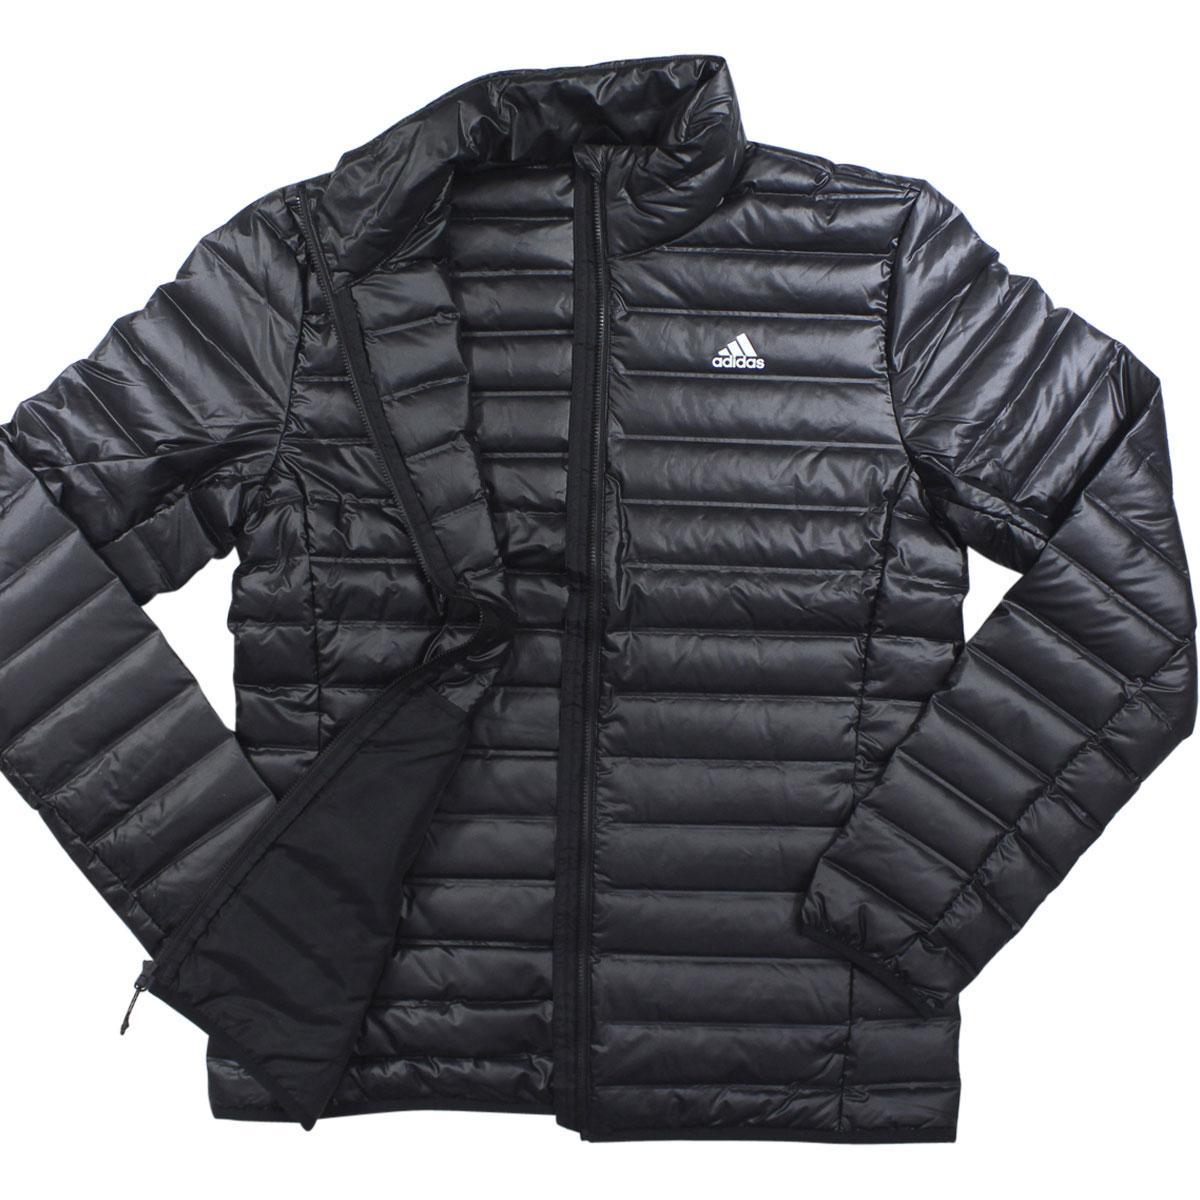 Adidas Men's All Weather Performance Varilite Water Repellant Jacket